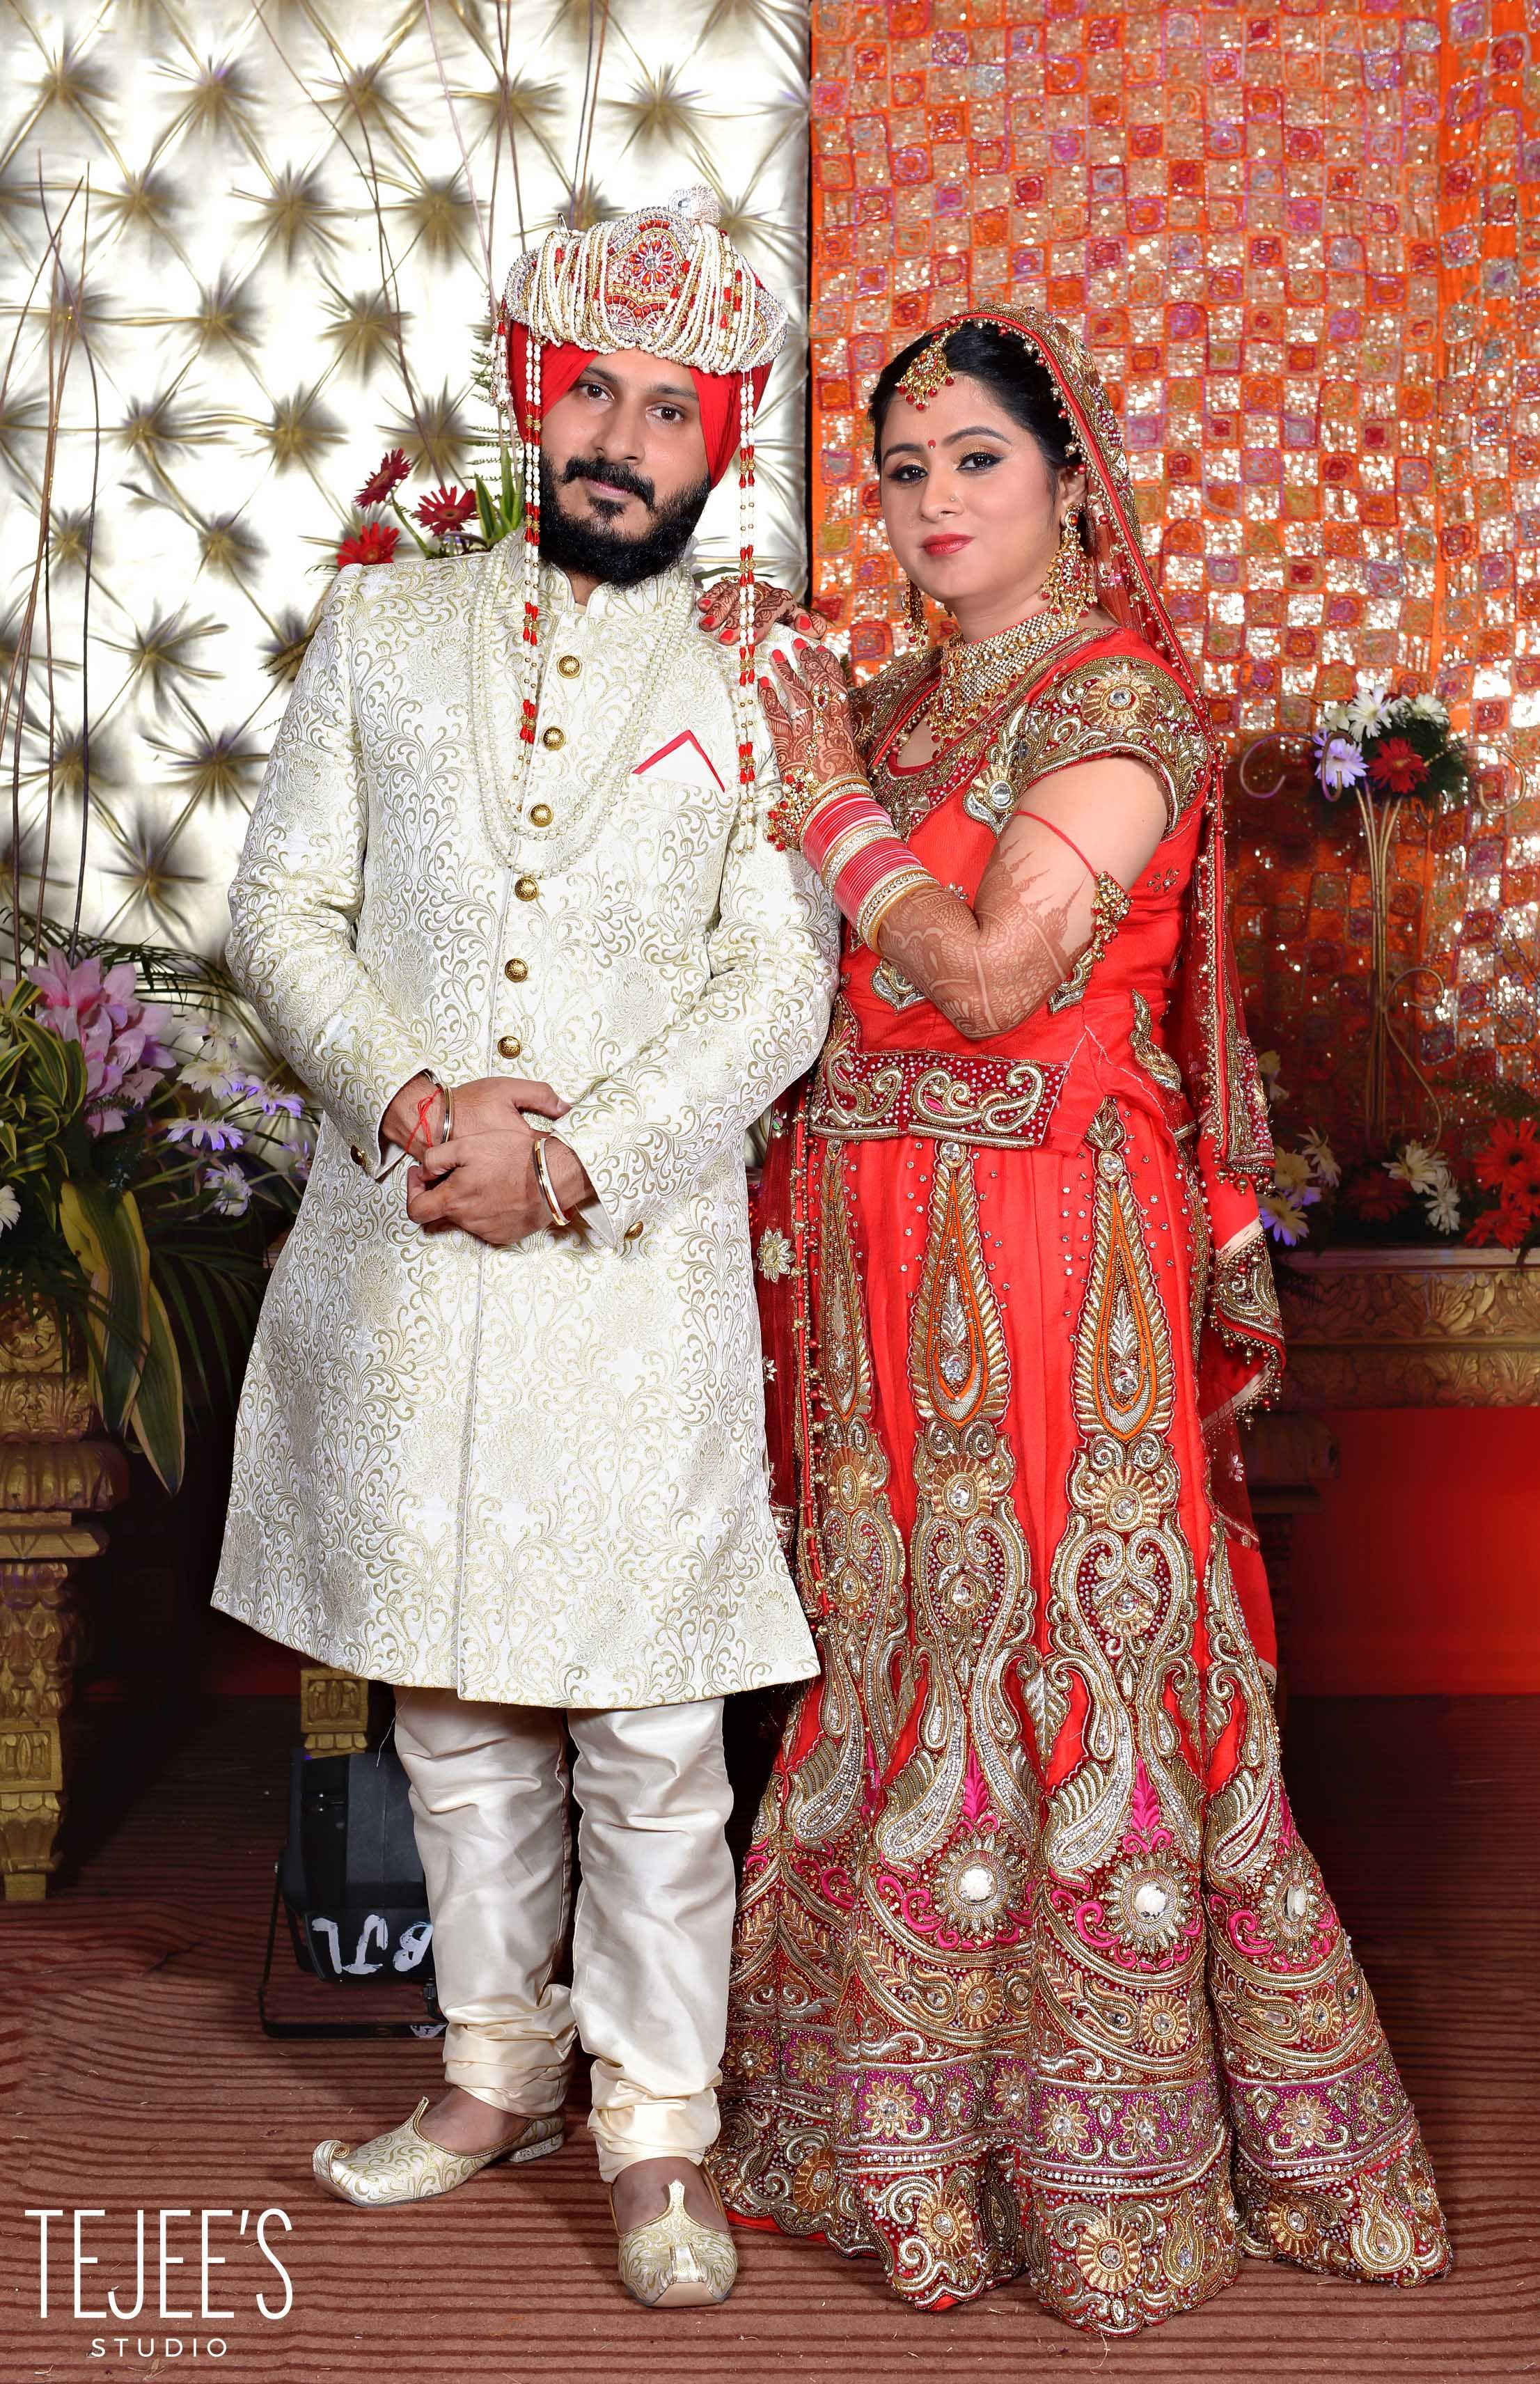 Photography wedding couple poses